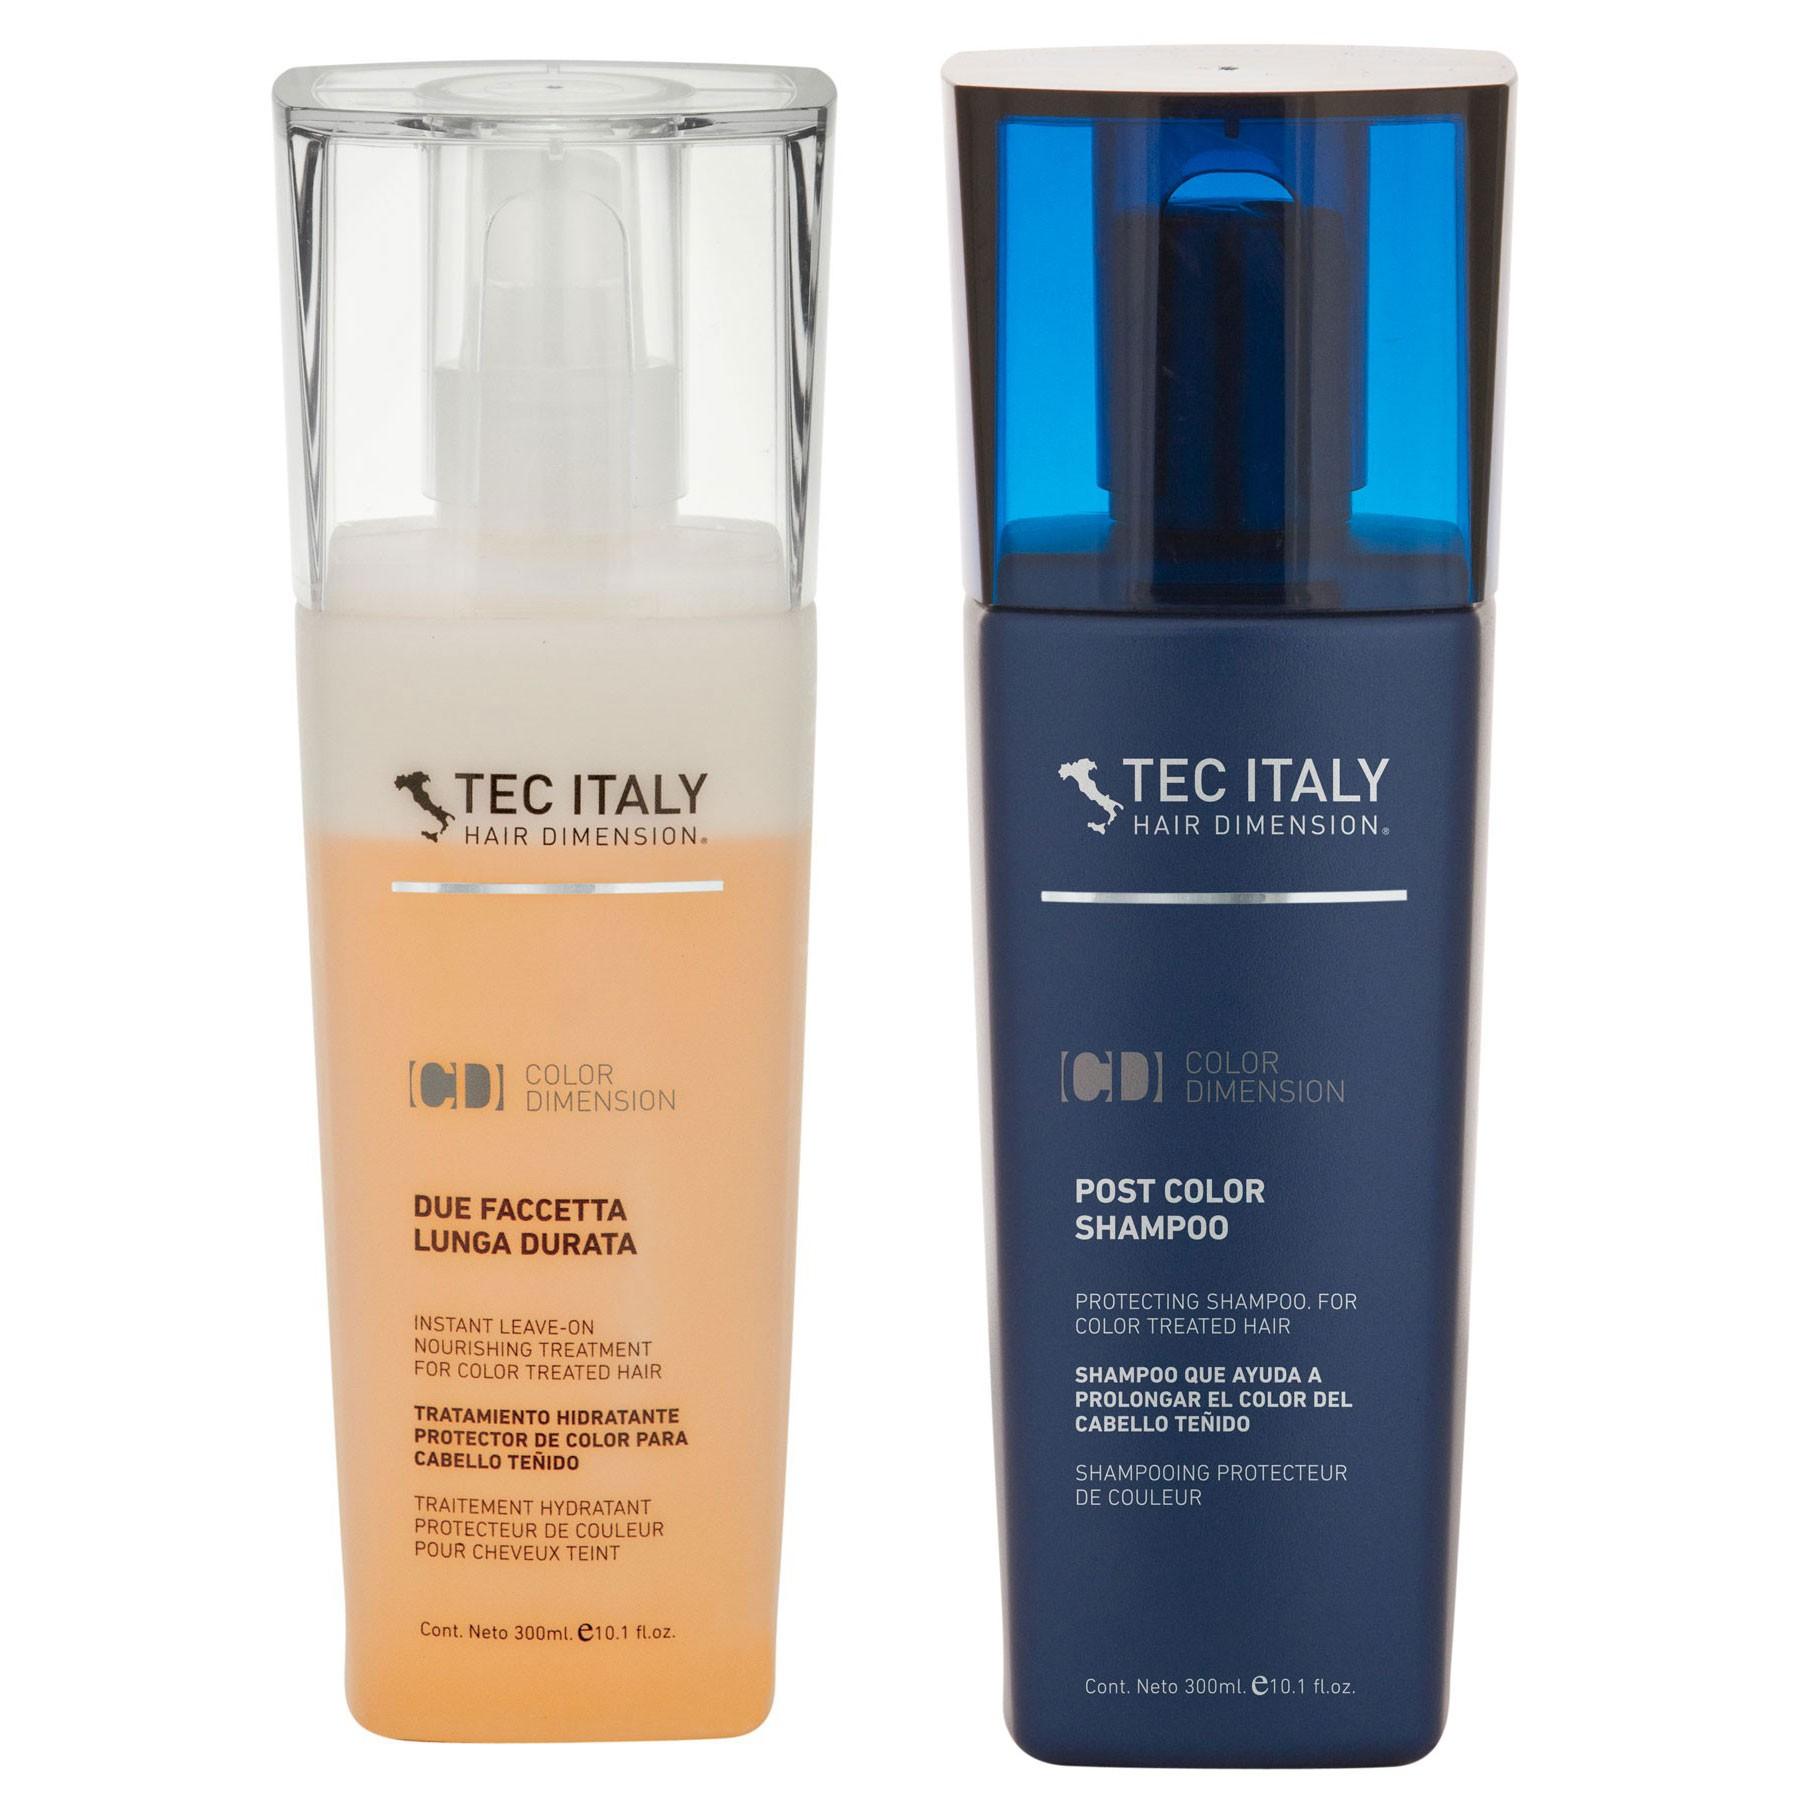 Kit Post Color Shampoo - Tratamiento Due Faccetta Tec Italy